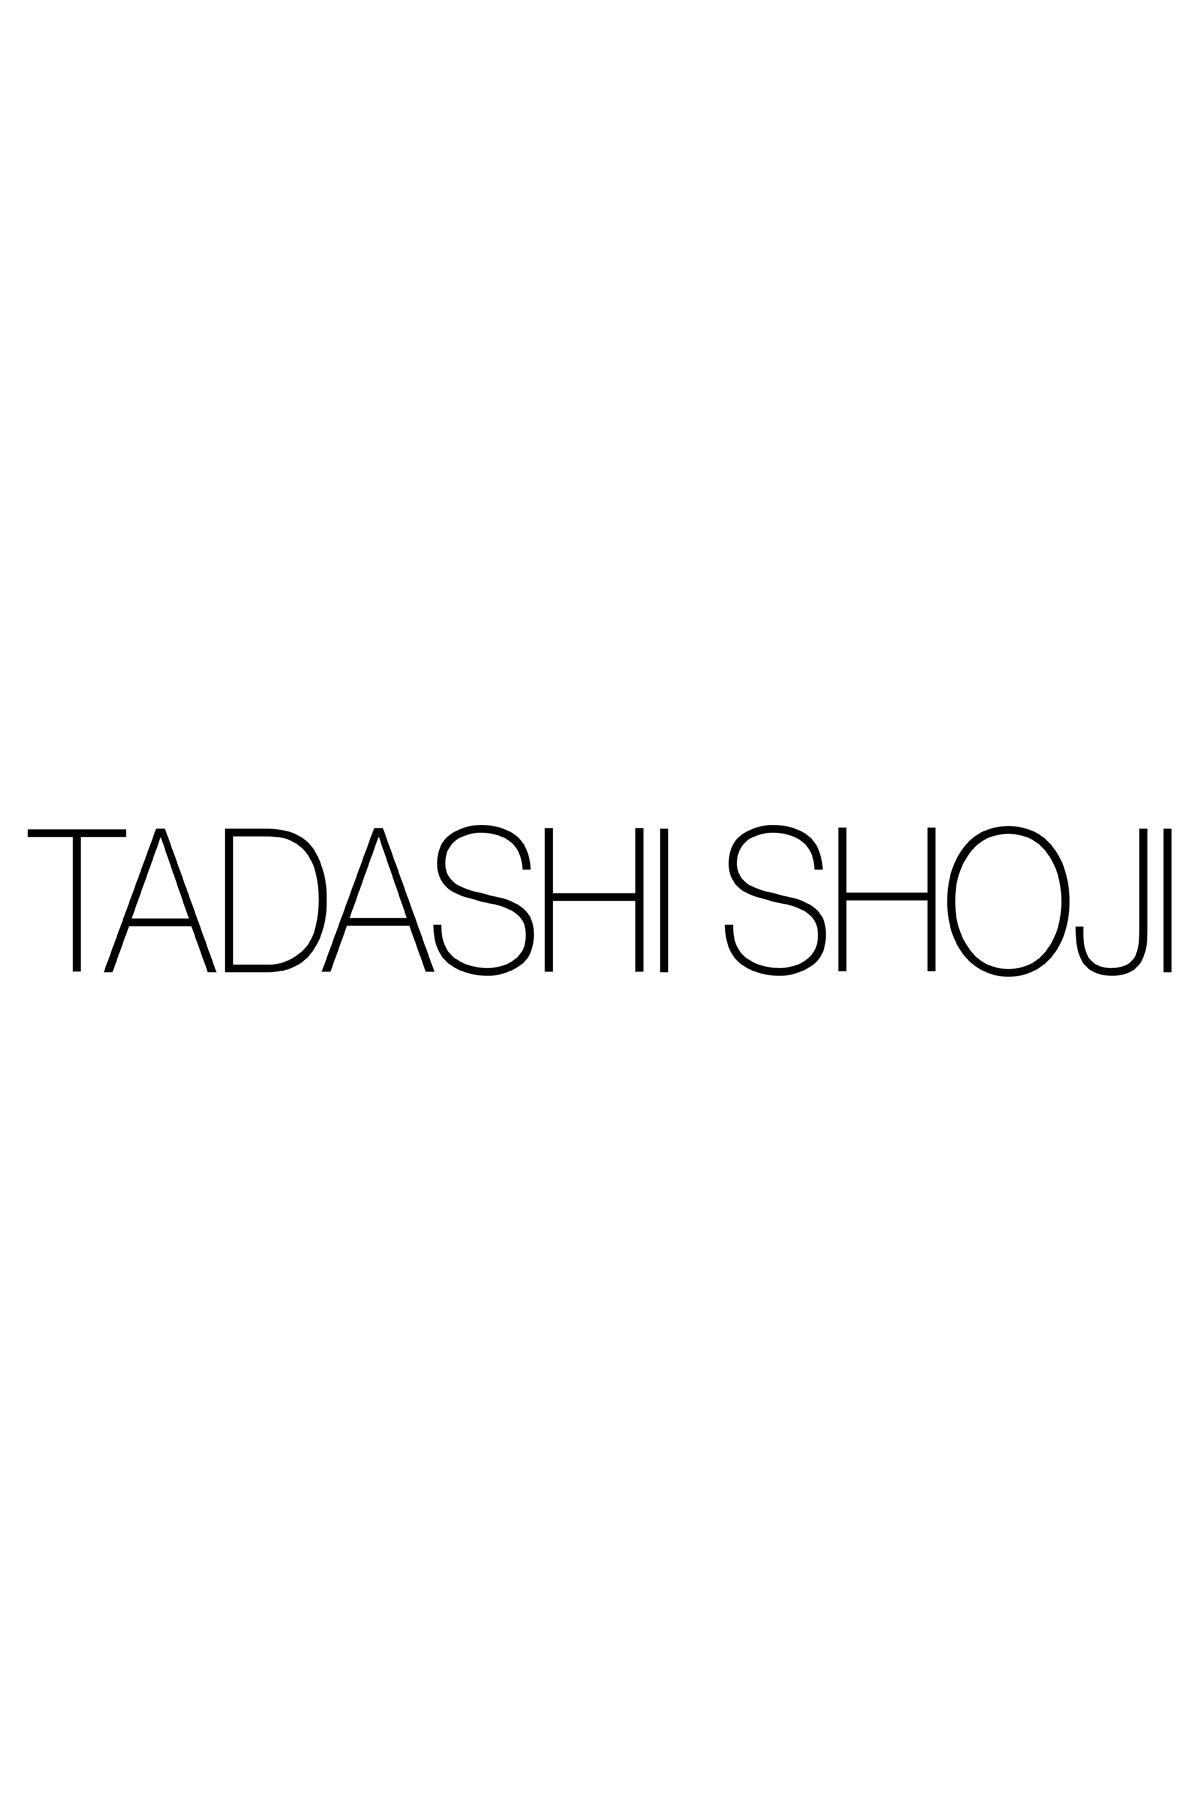 Alexandra Embroidered Lace Gown | Tadashi Shoji